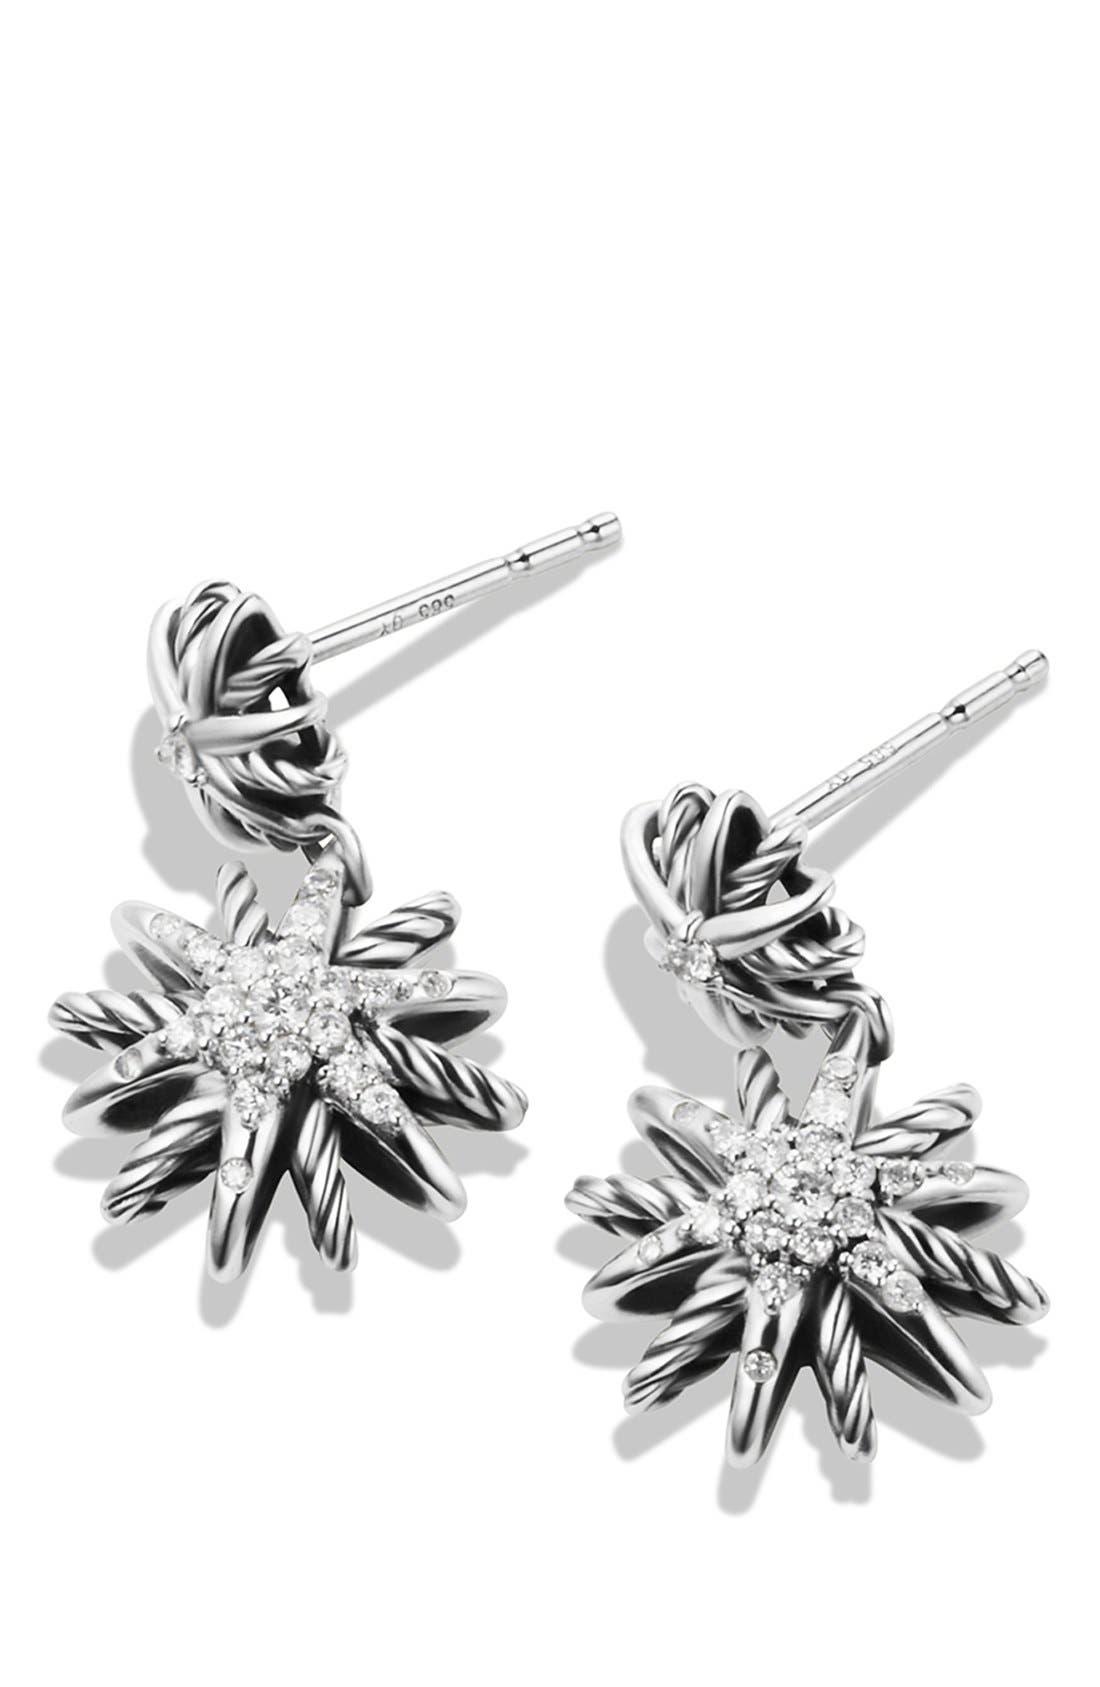 'Starburst' Double-Drop Earrings with Diamonds,                             Alternate thumbnail 2, color,                             Diamond